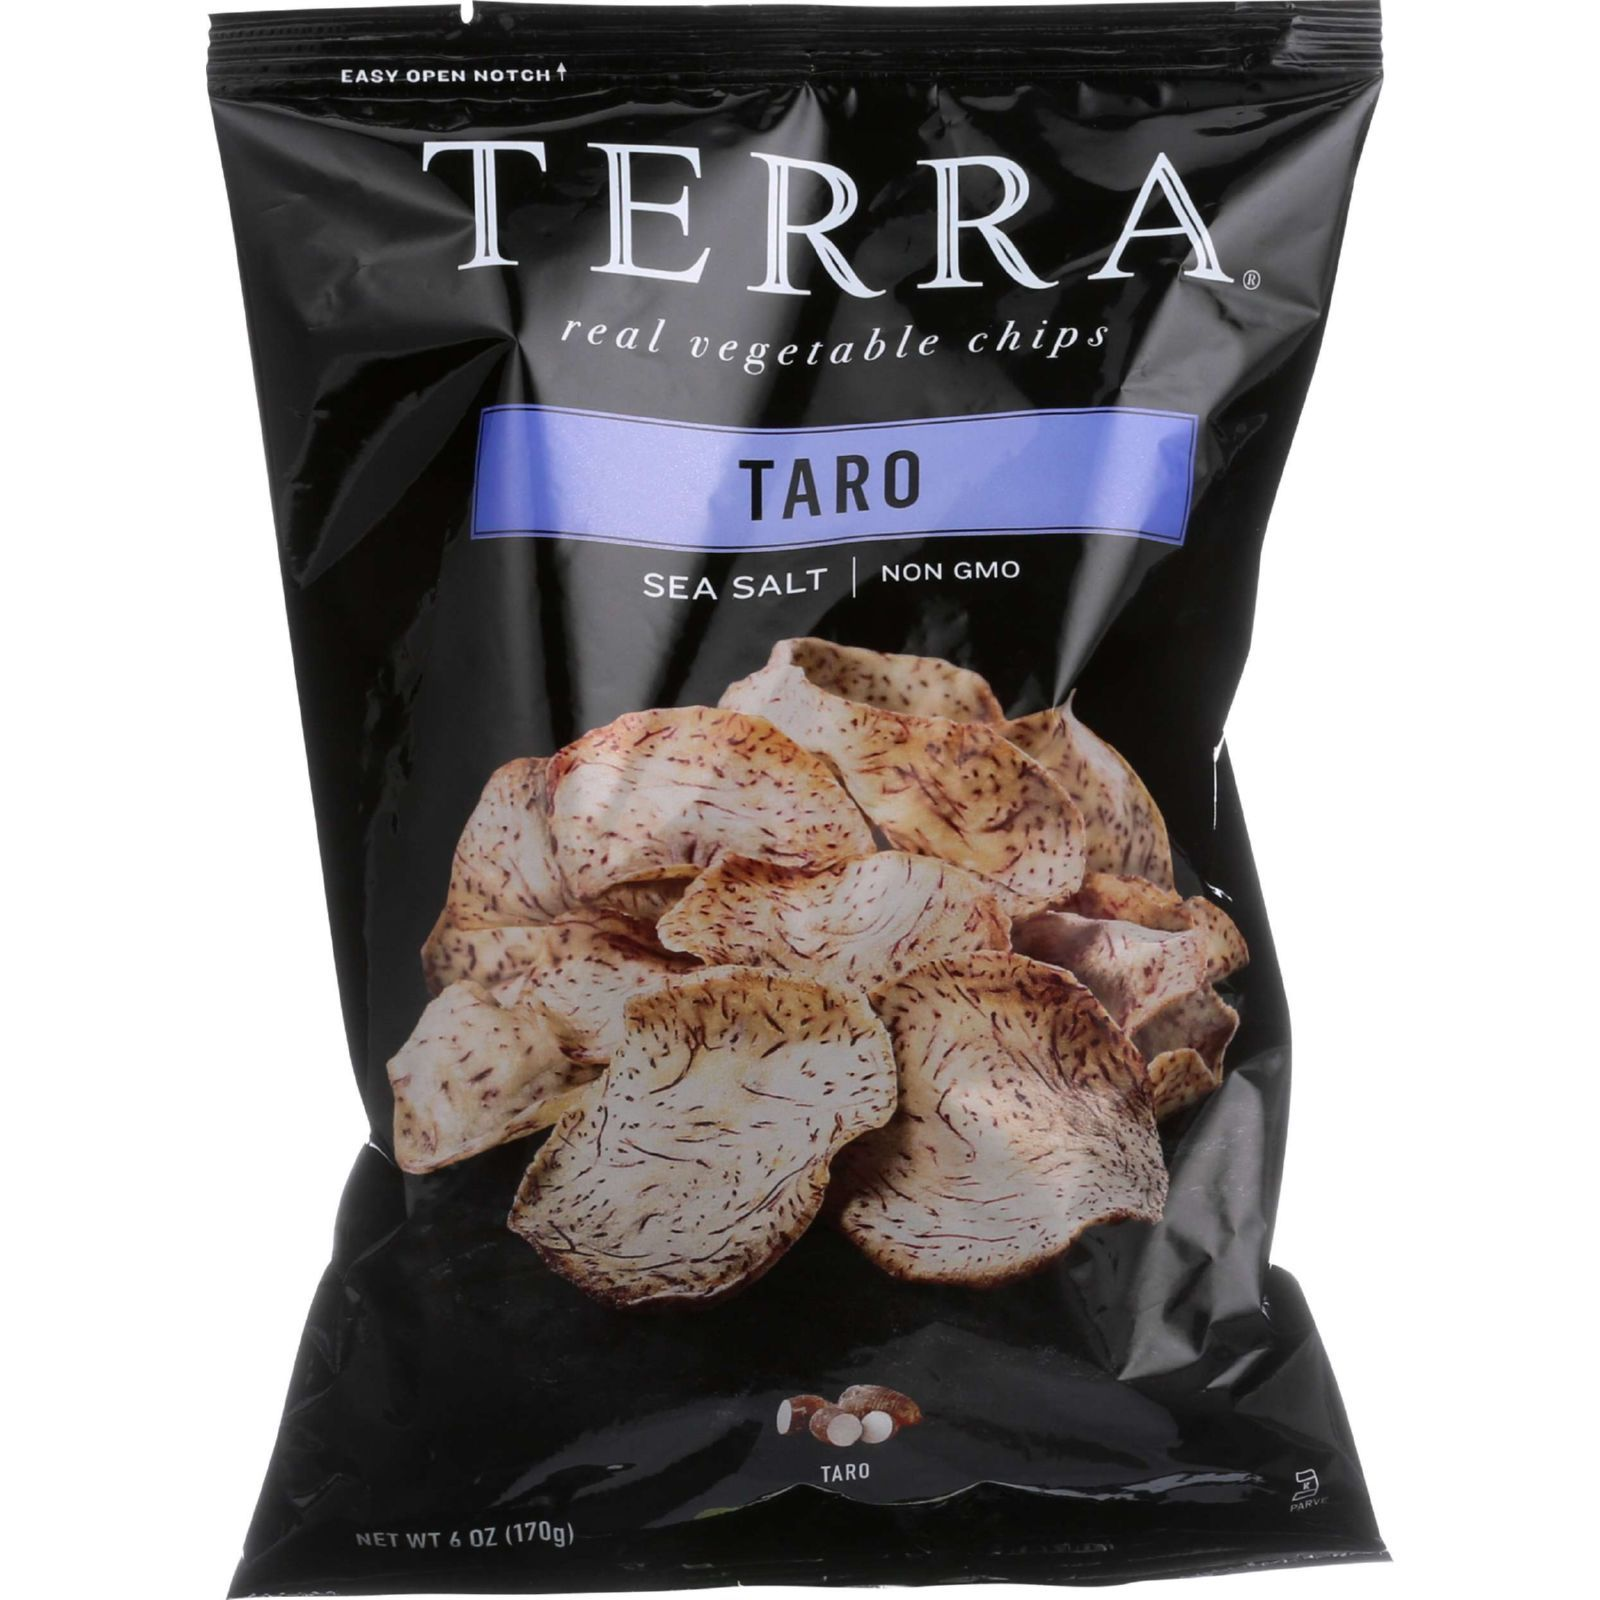 Terra Chips Chips - Exotic Vegetable - Taro - 6 oz - case of 12